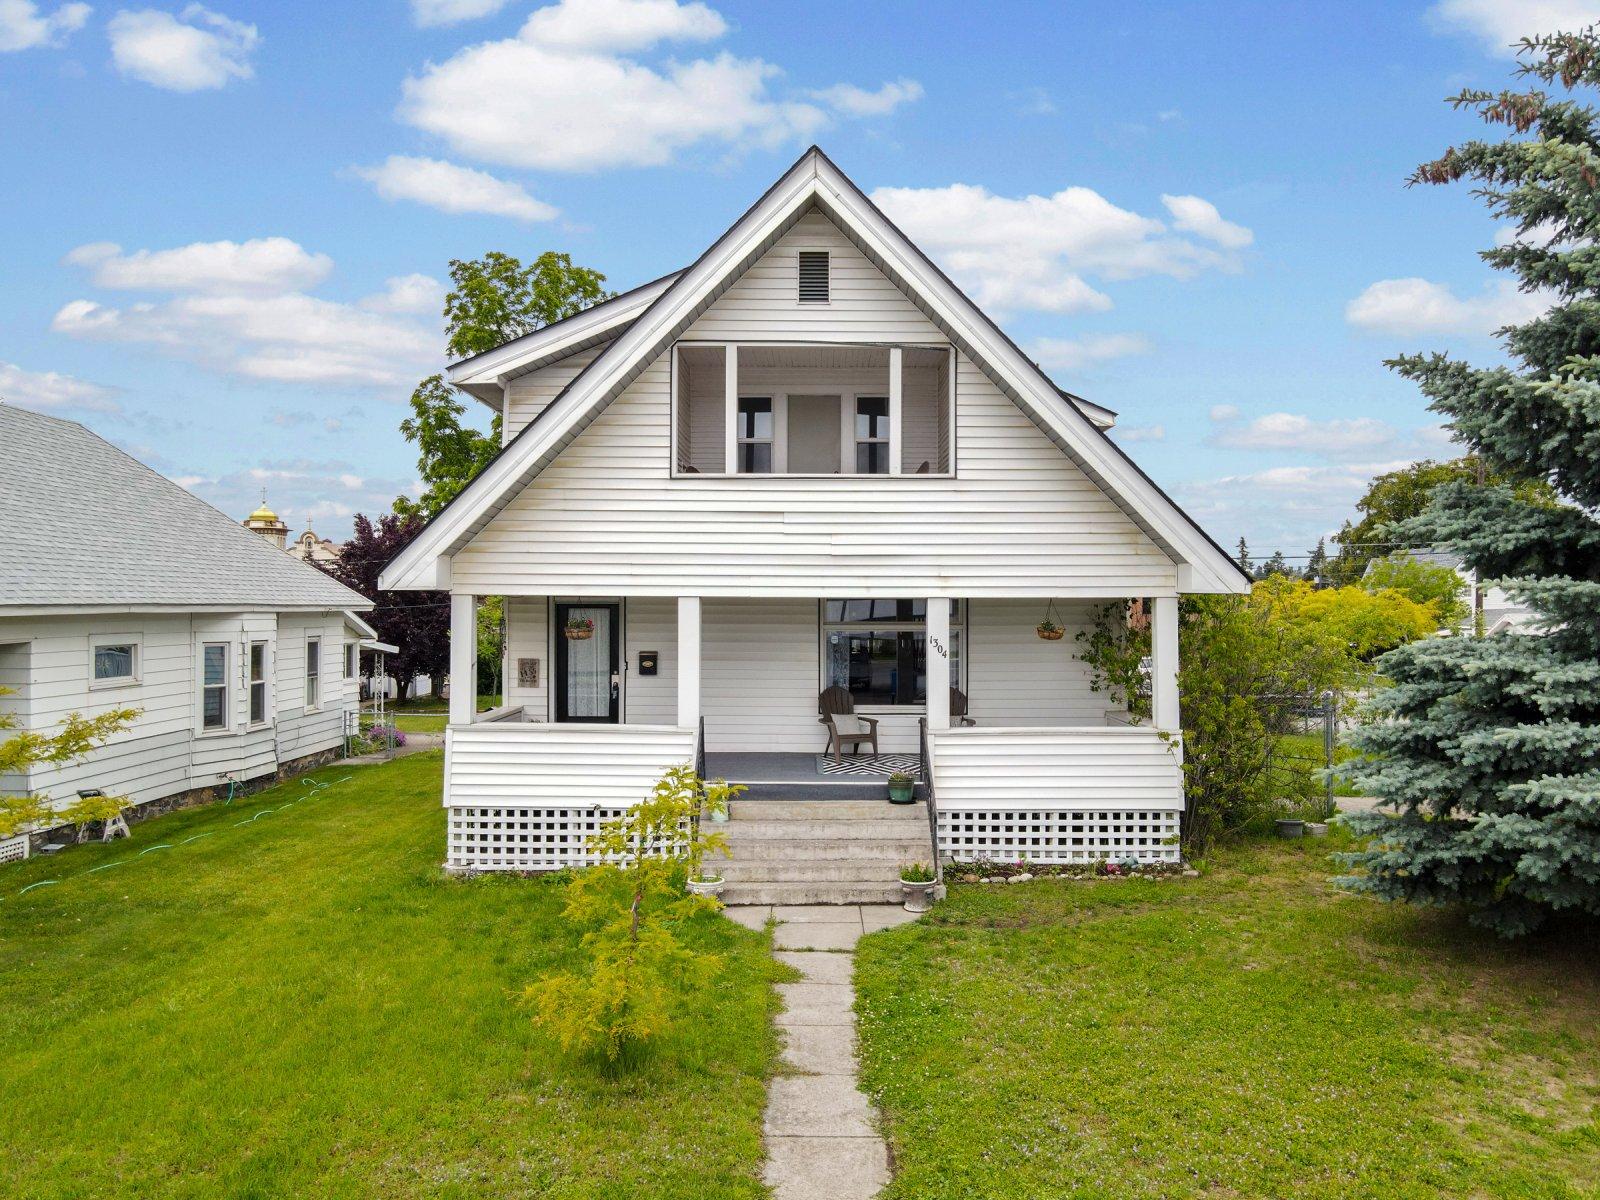 Homes for Sale in Shadle Spokane